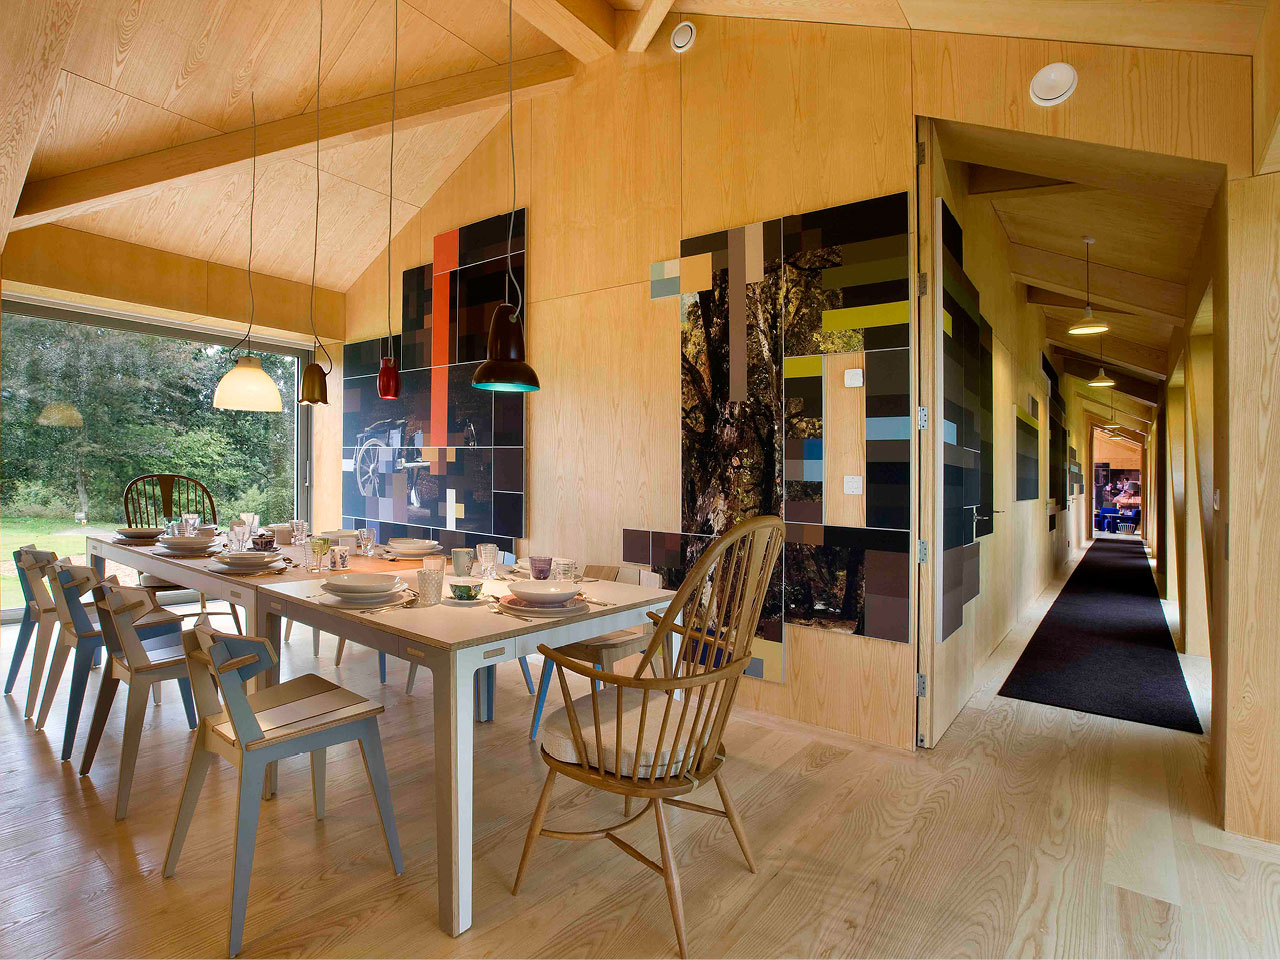 The balancing barn ideasgn07 mvrdv for living architecture ideasgn - The balancing barn plunging architecture ...